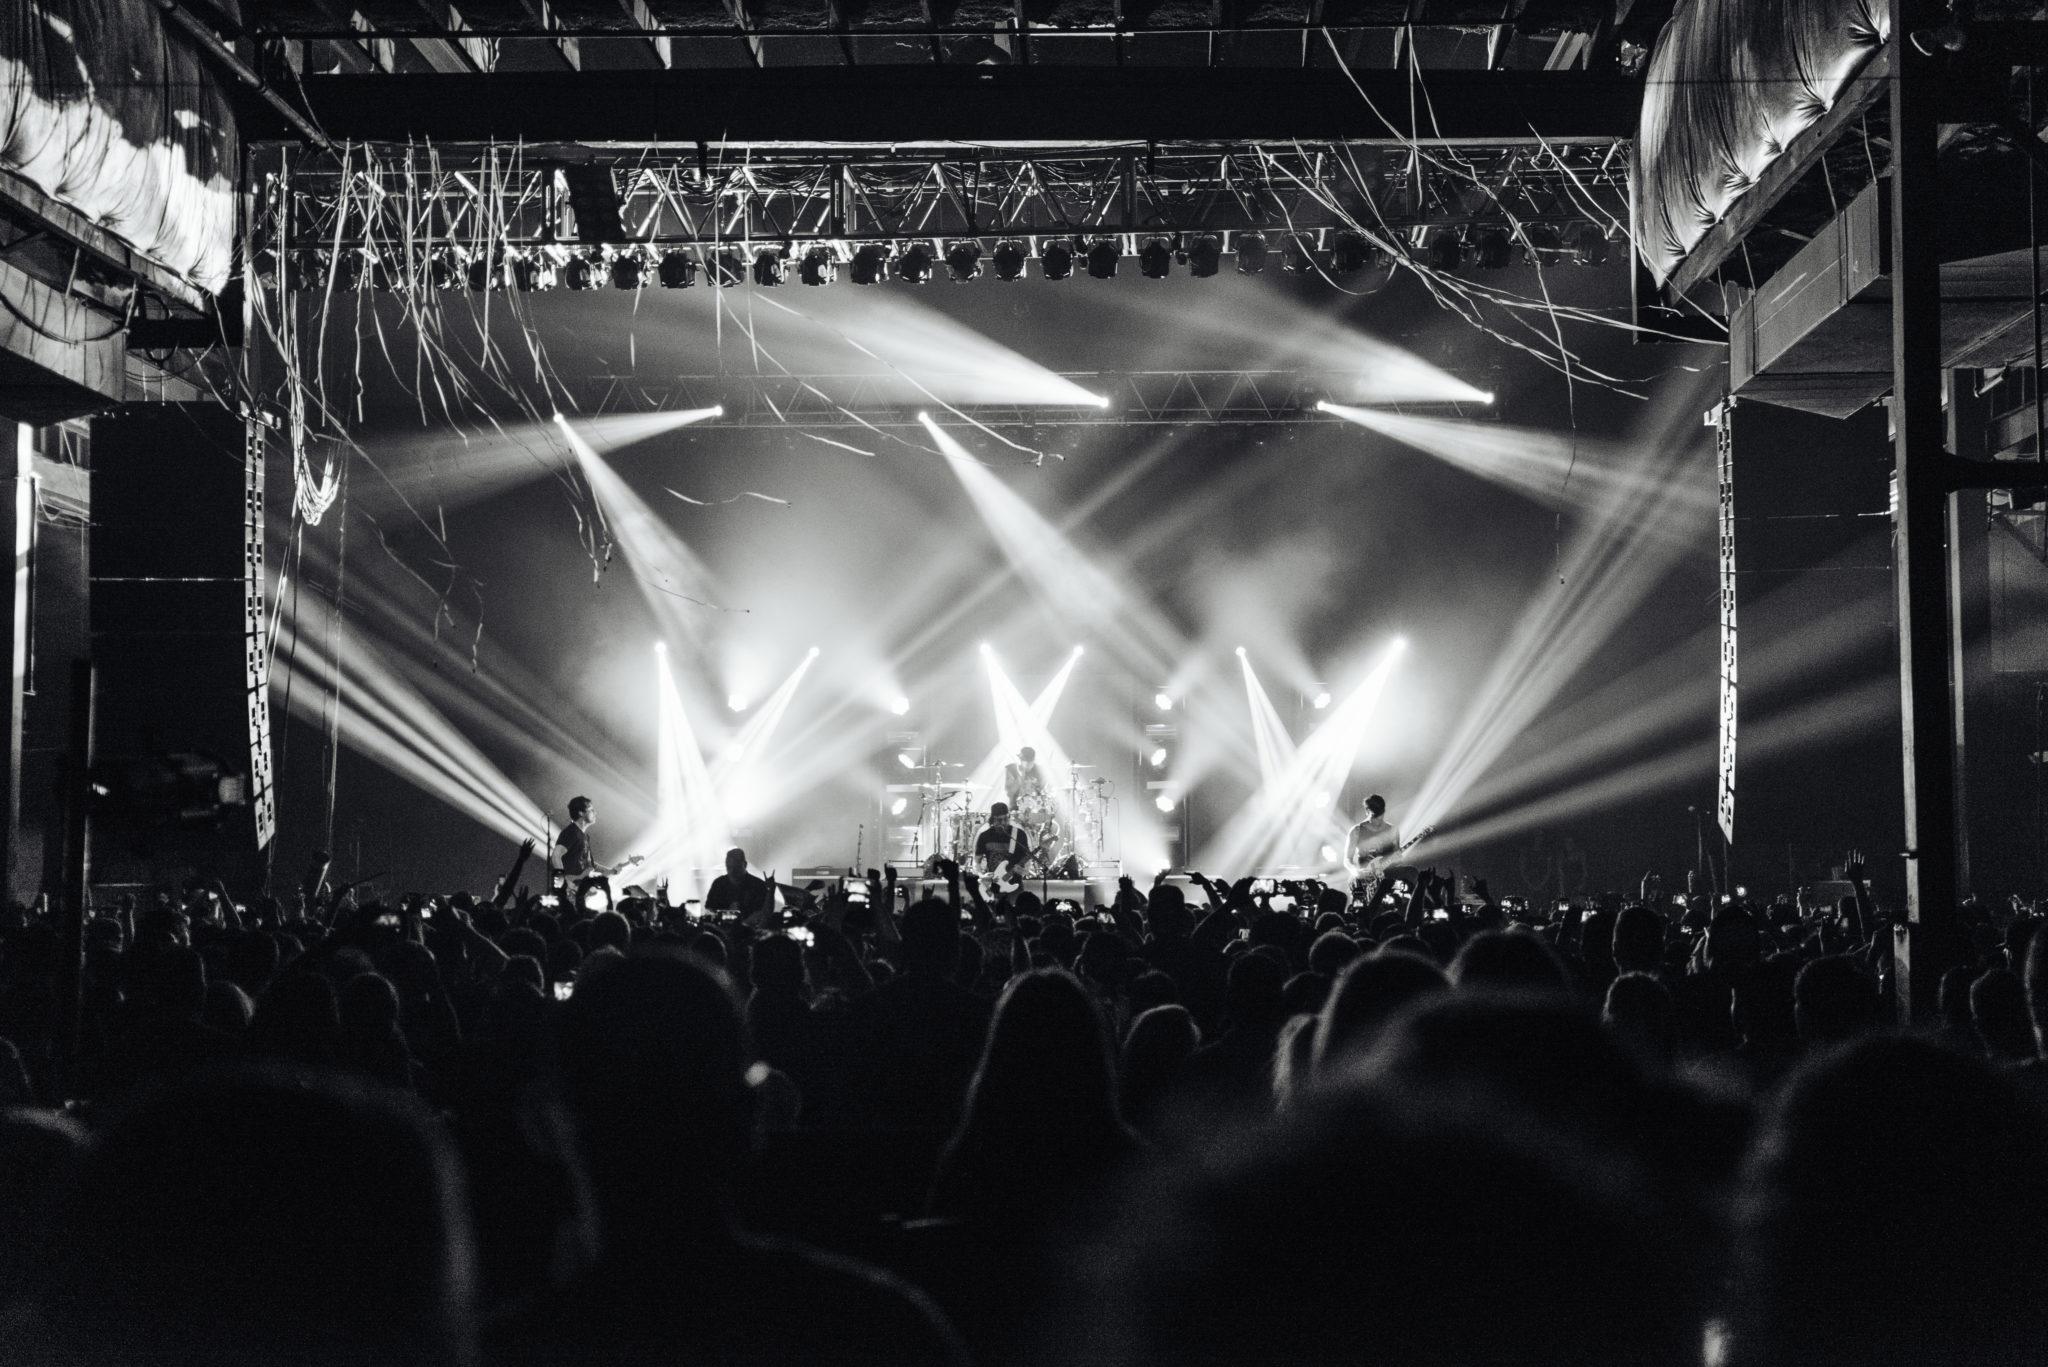 PHOTOS: Pierce The Veil light up South Side Ballroom in Dallas